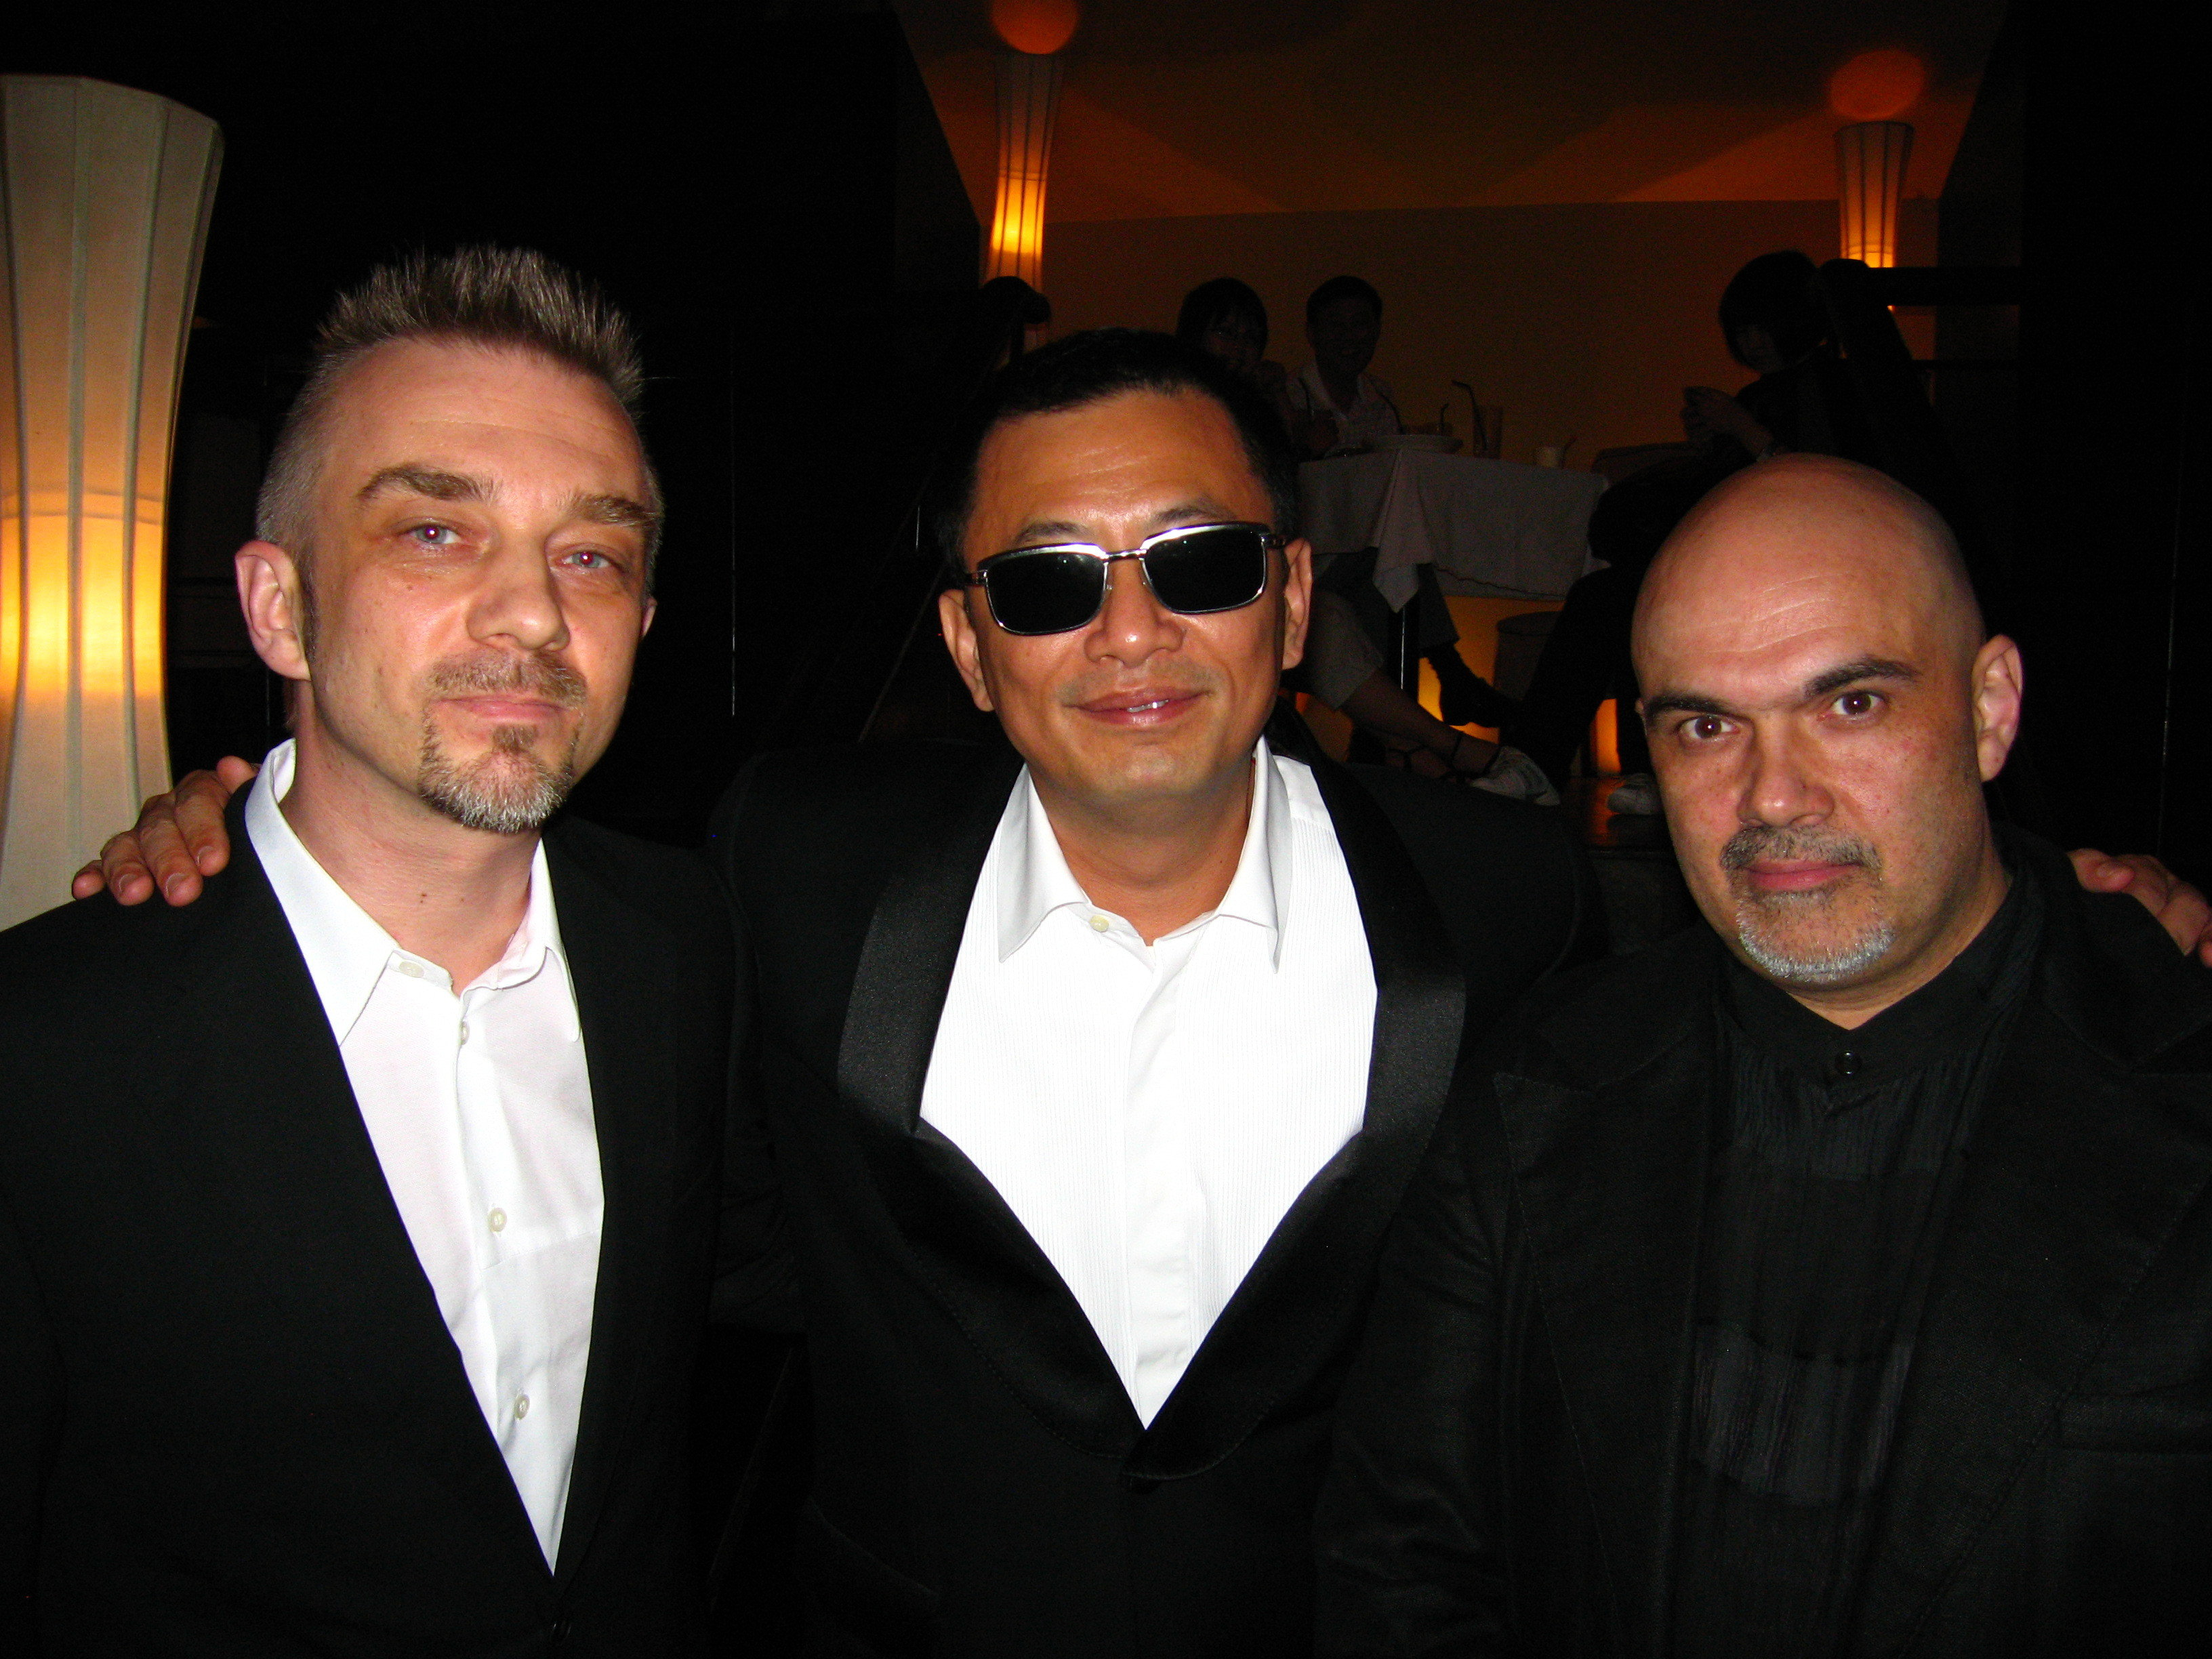 After Award Ceremony of Shanghai Int'l Film festival - (from left) Andrius Mamontovas (Best Music award), Kar Wai Wong (Head of Jury), Maris Martinsons (Best Director award)